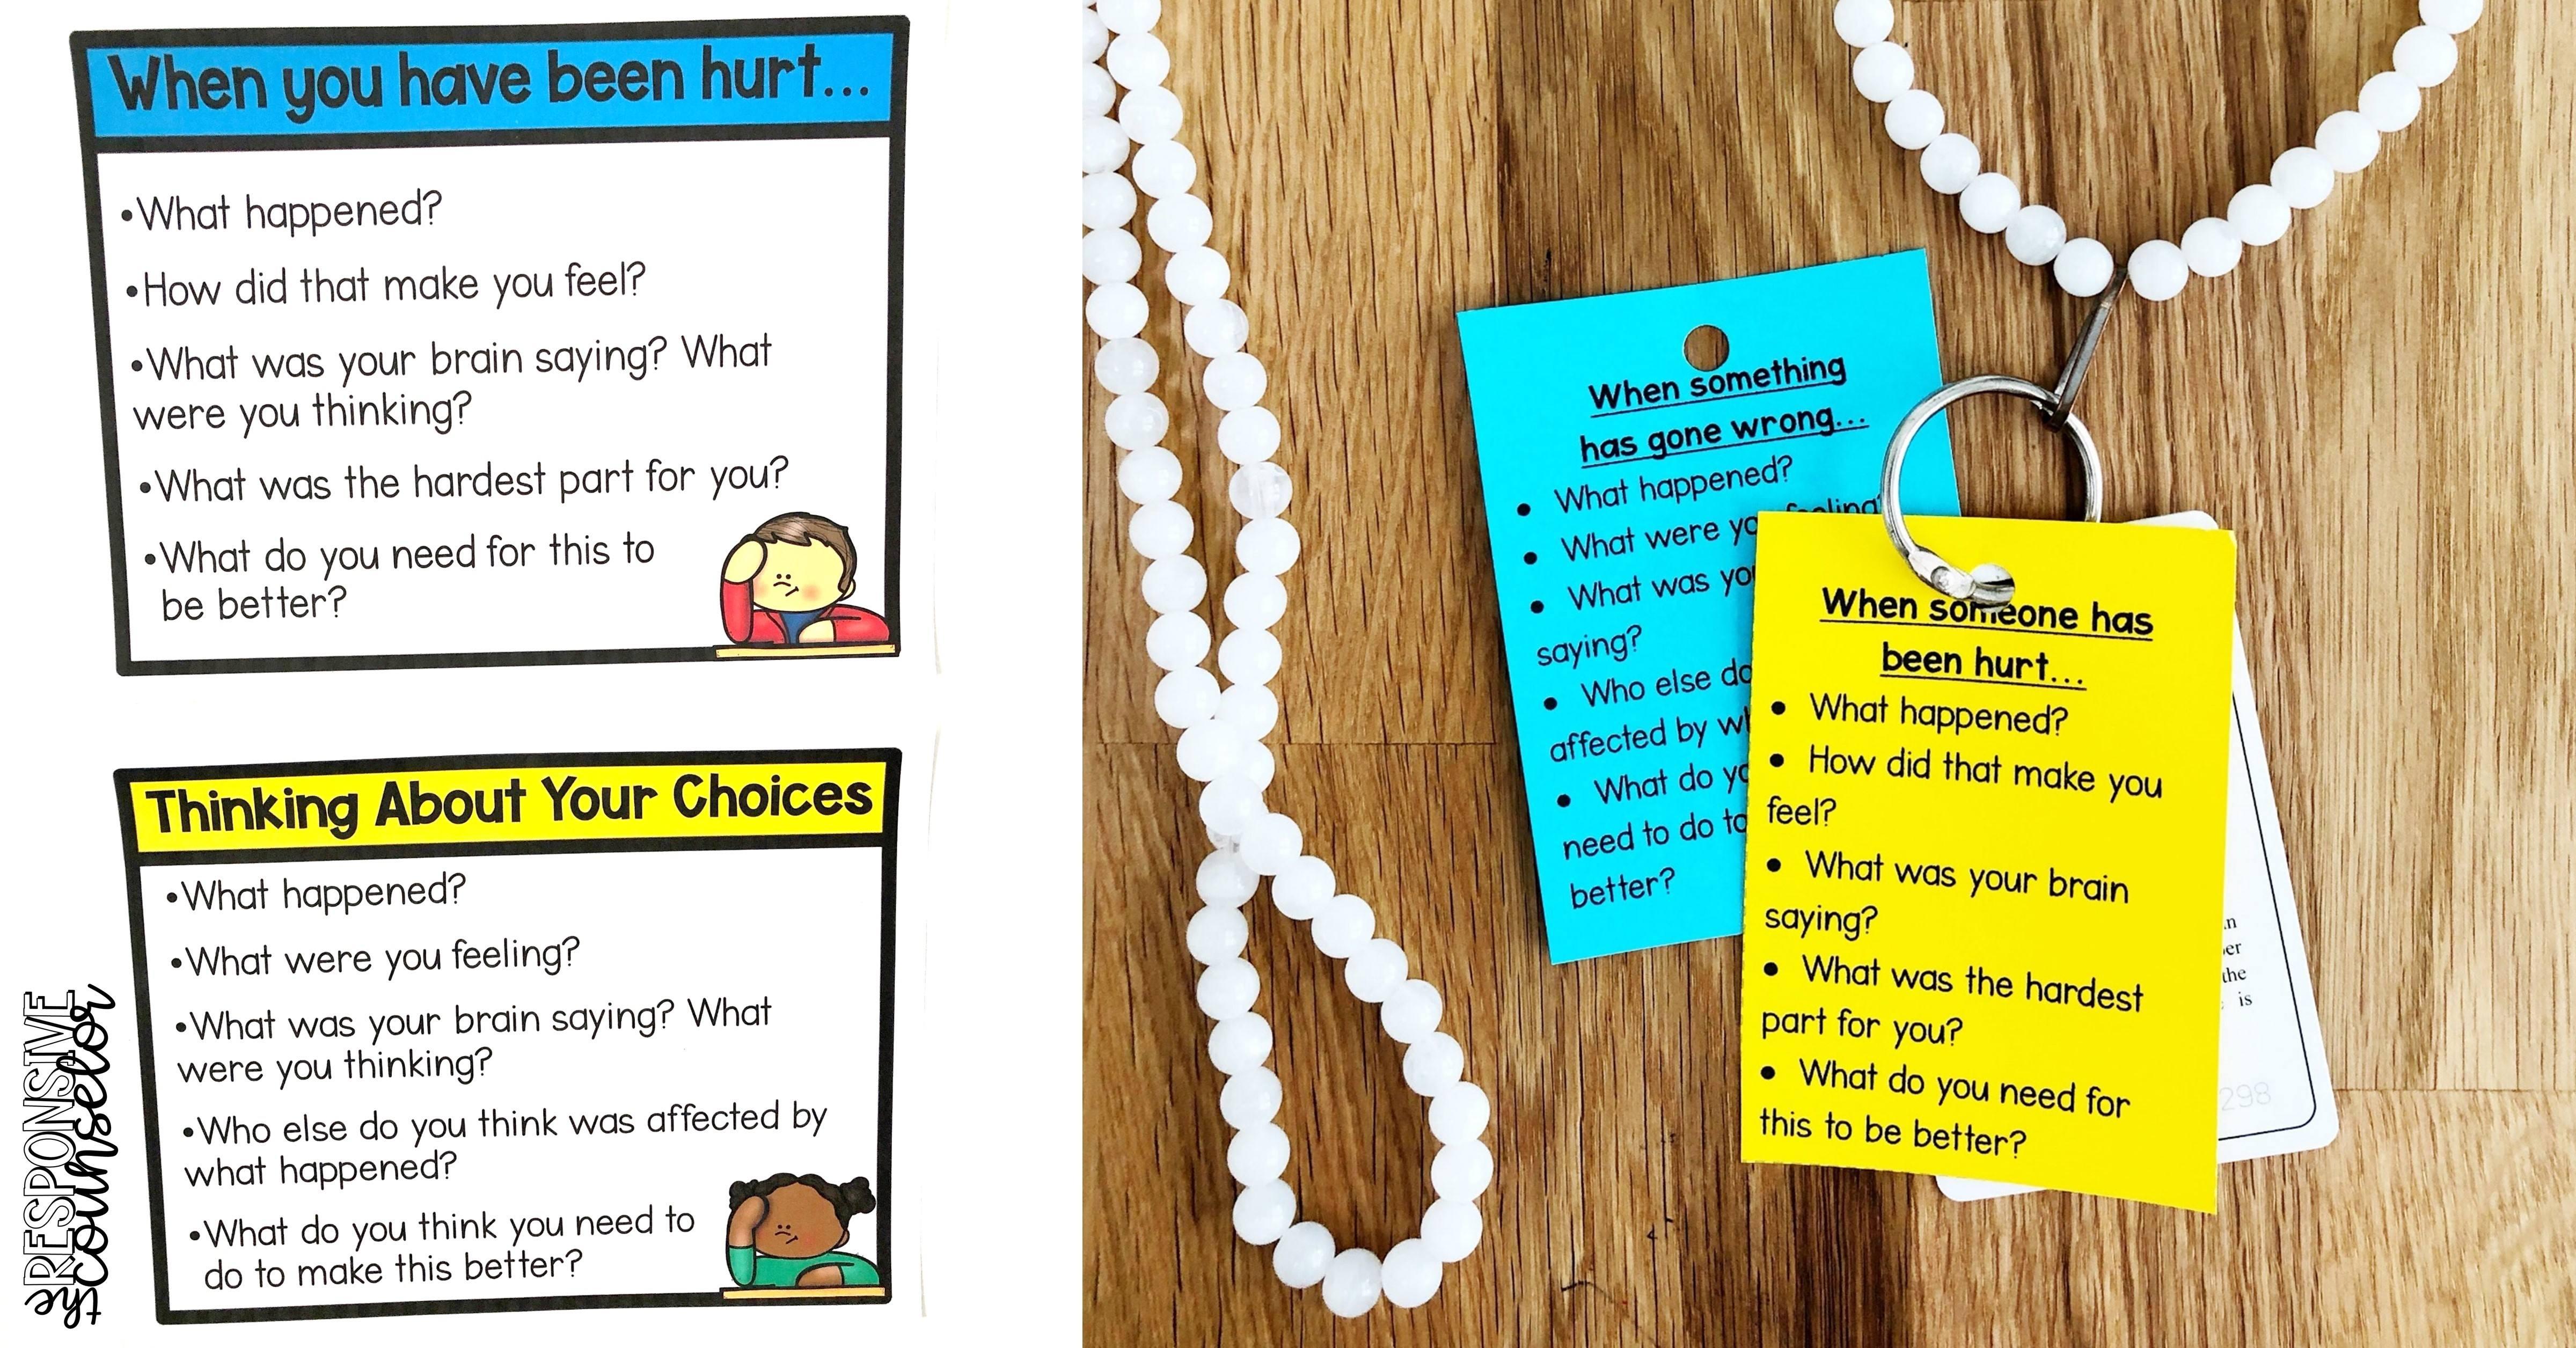 restorative practices classroom visuals